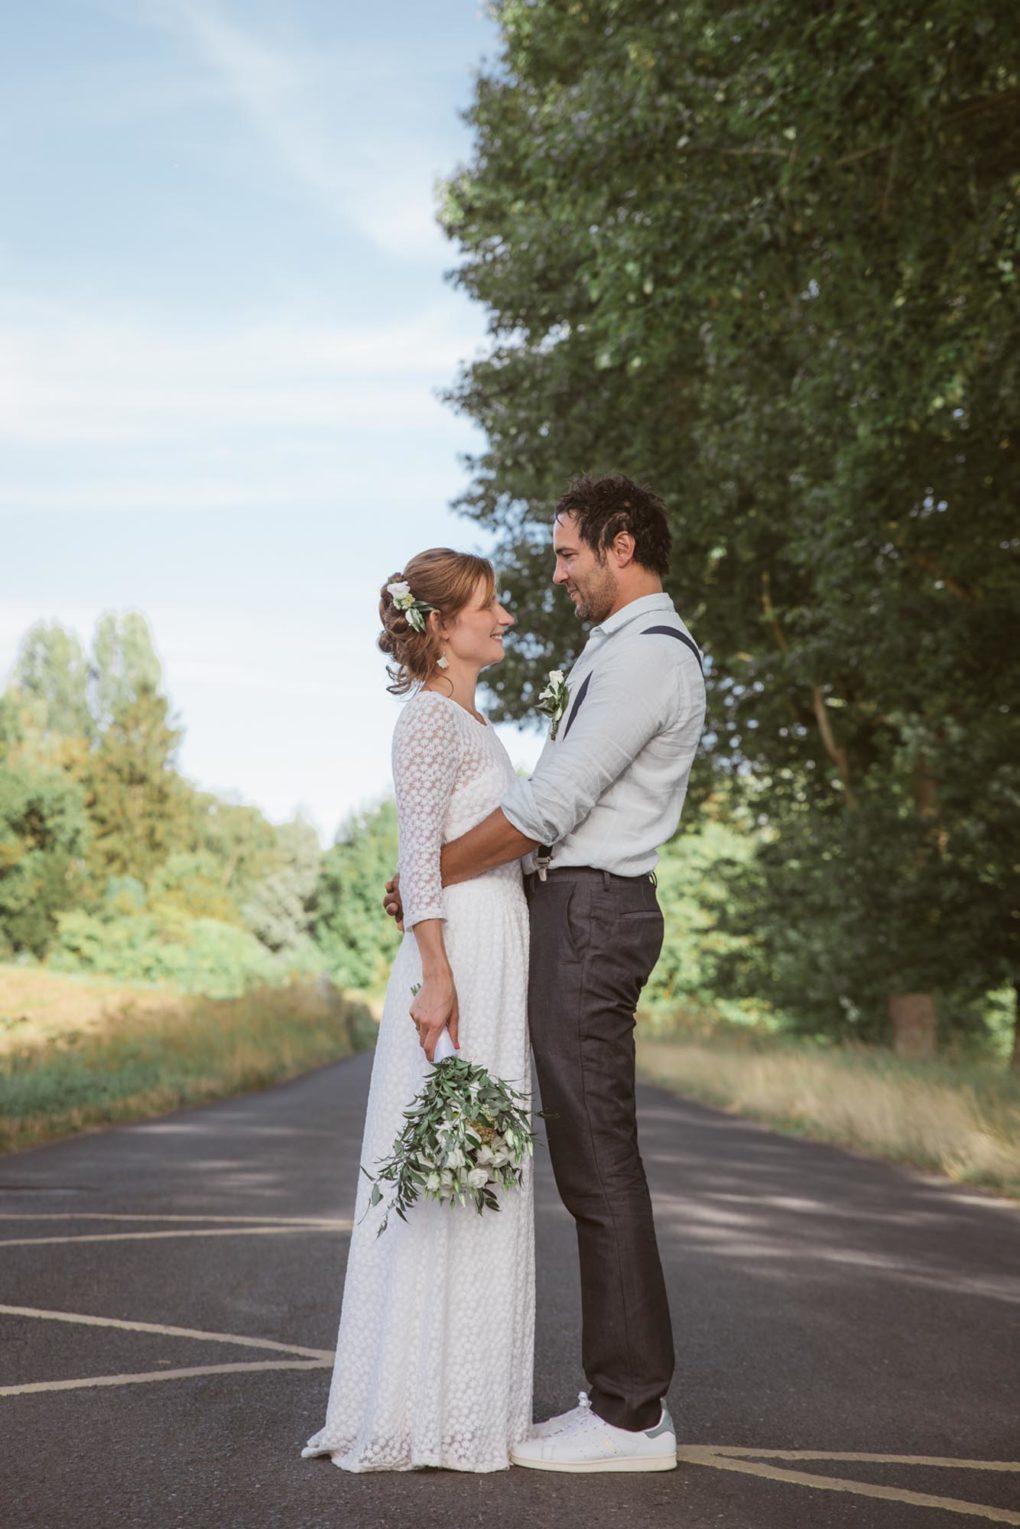 maldeme photographe mariage ferme vexin paris